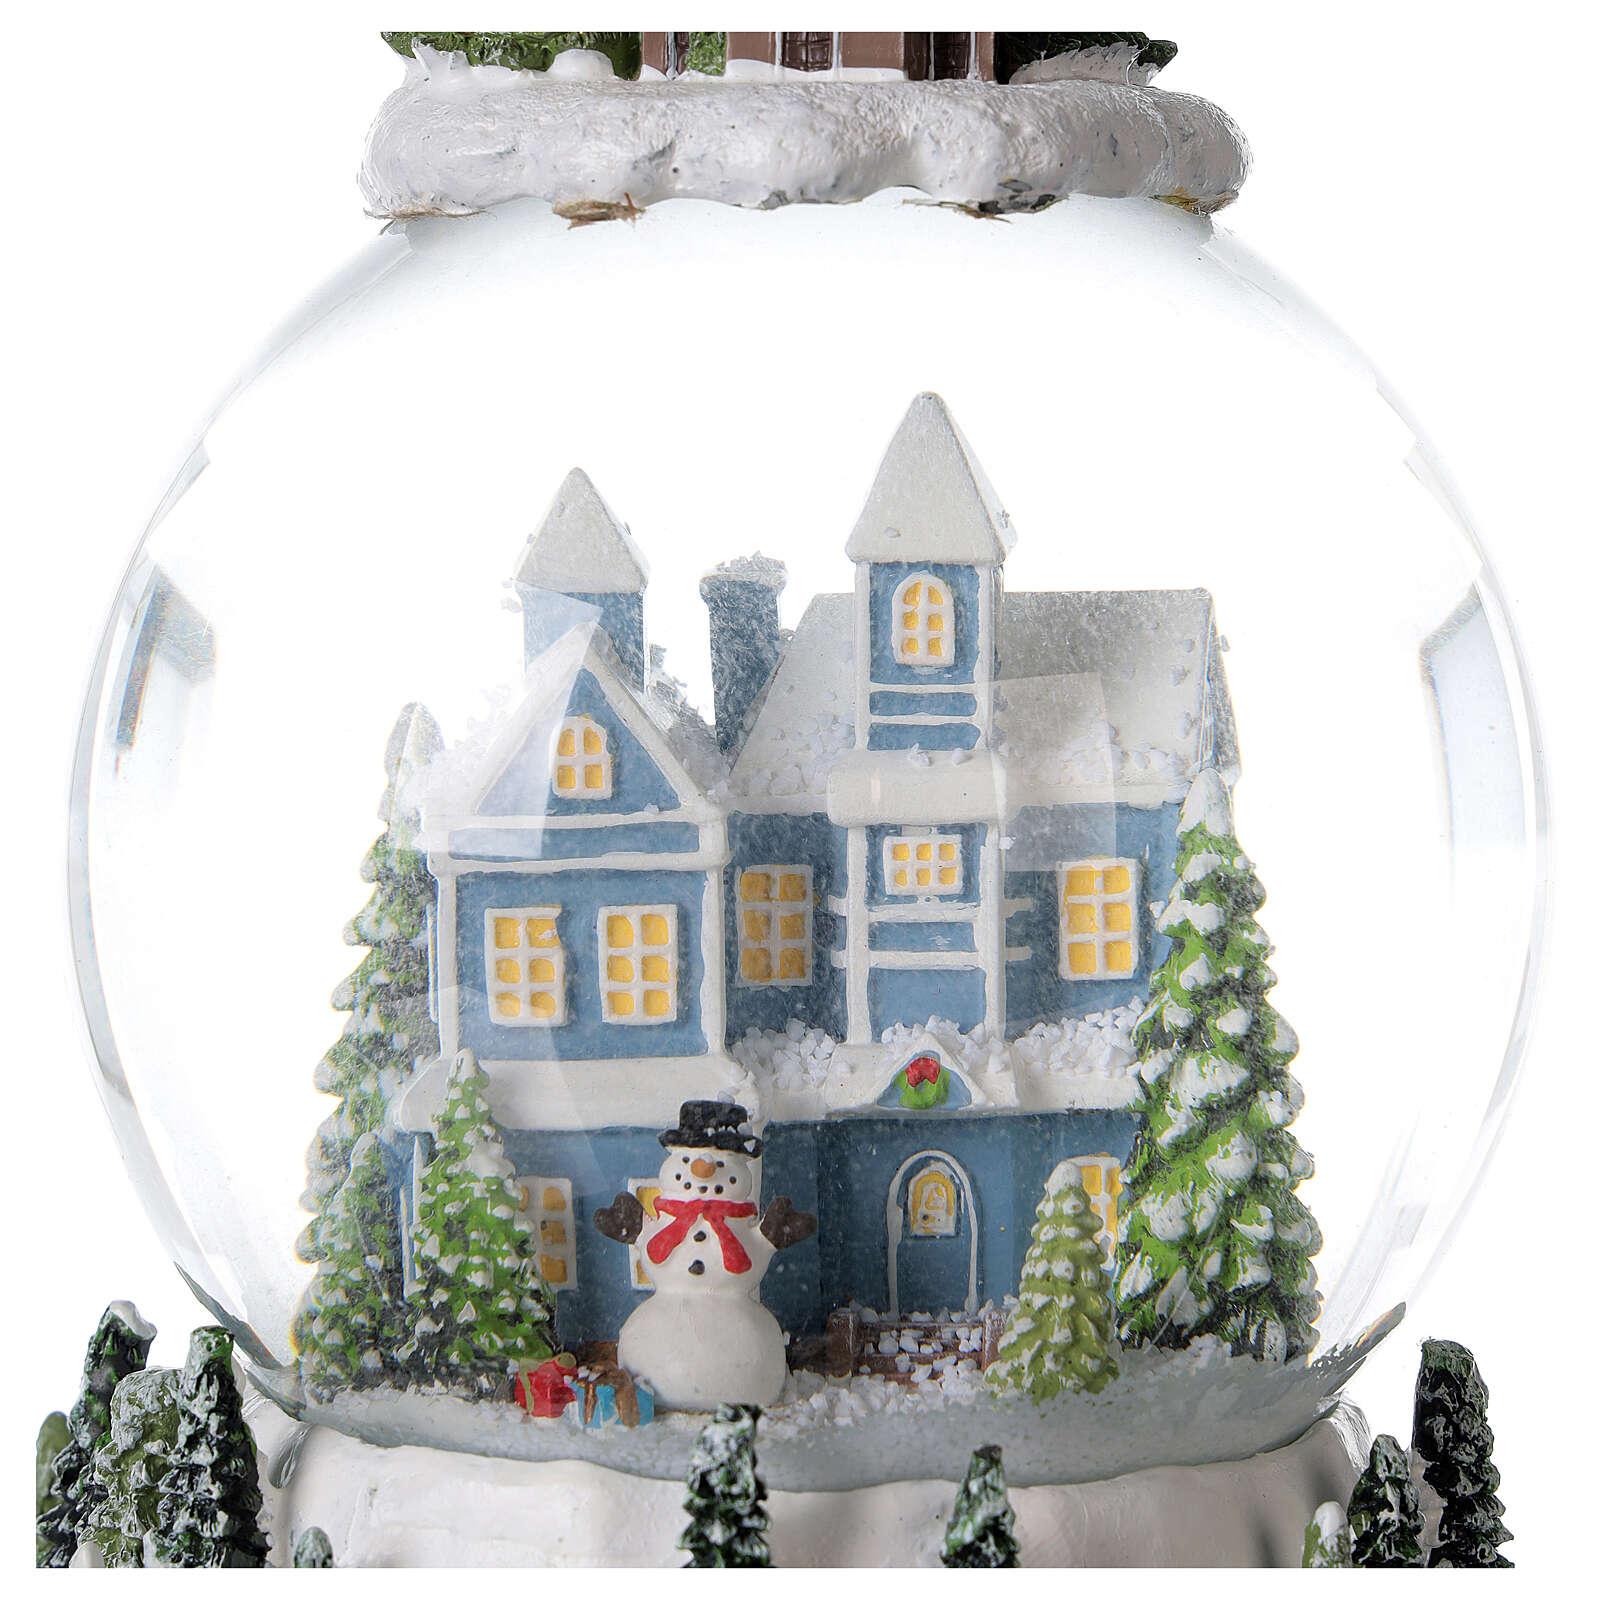 Musical snow globe snowy house blue tree 15x10x10 cm 3